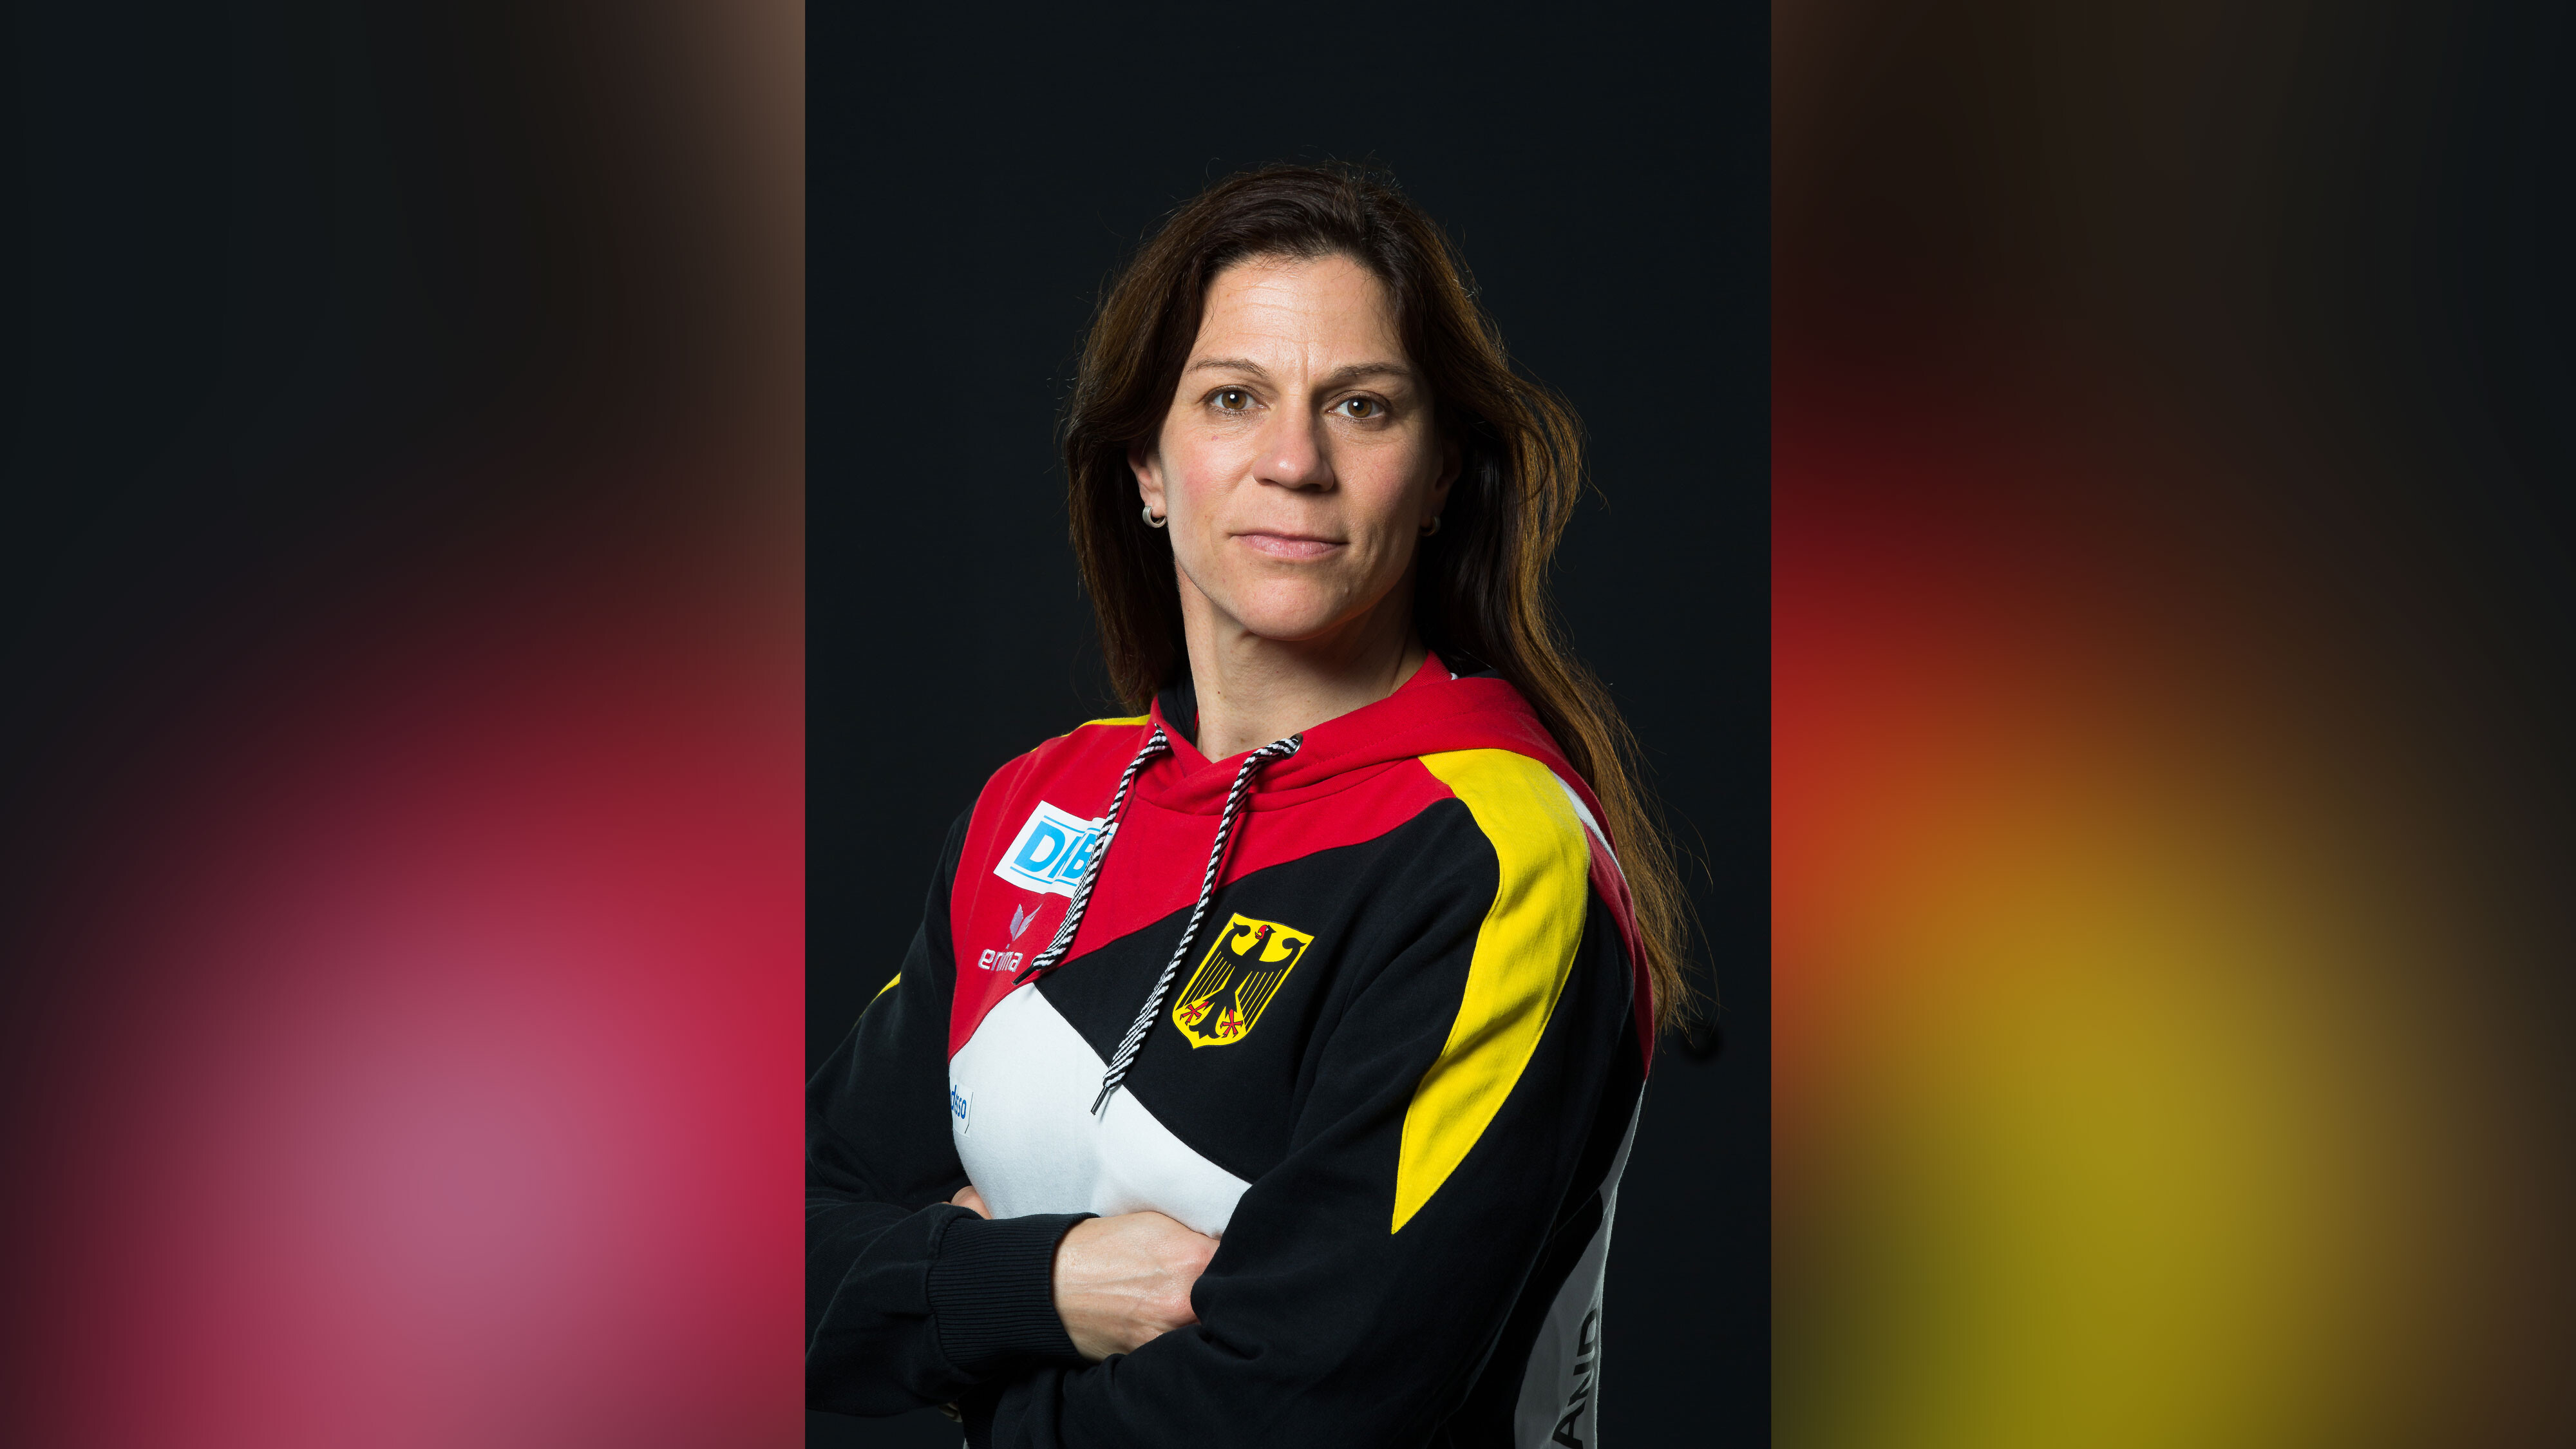 Kim Raisner: Germany's modern pentathlon coach disqualified from Olympics for hitting horse